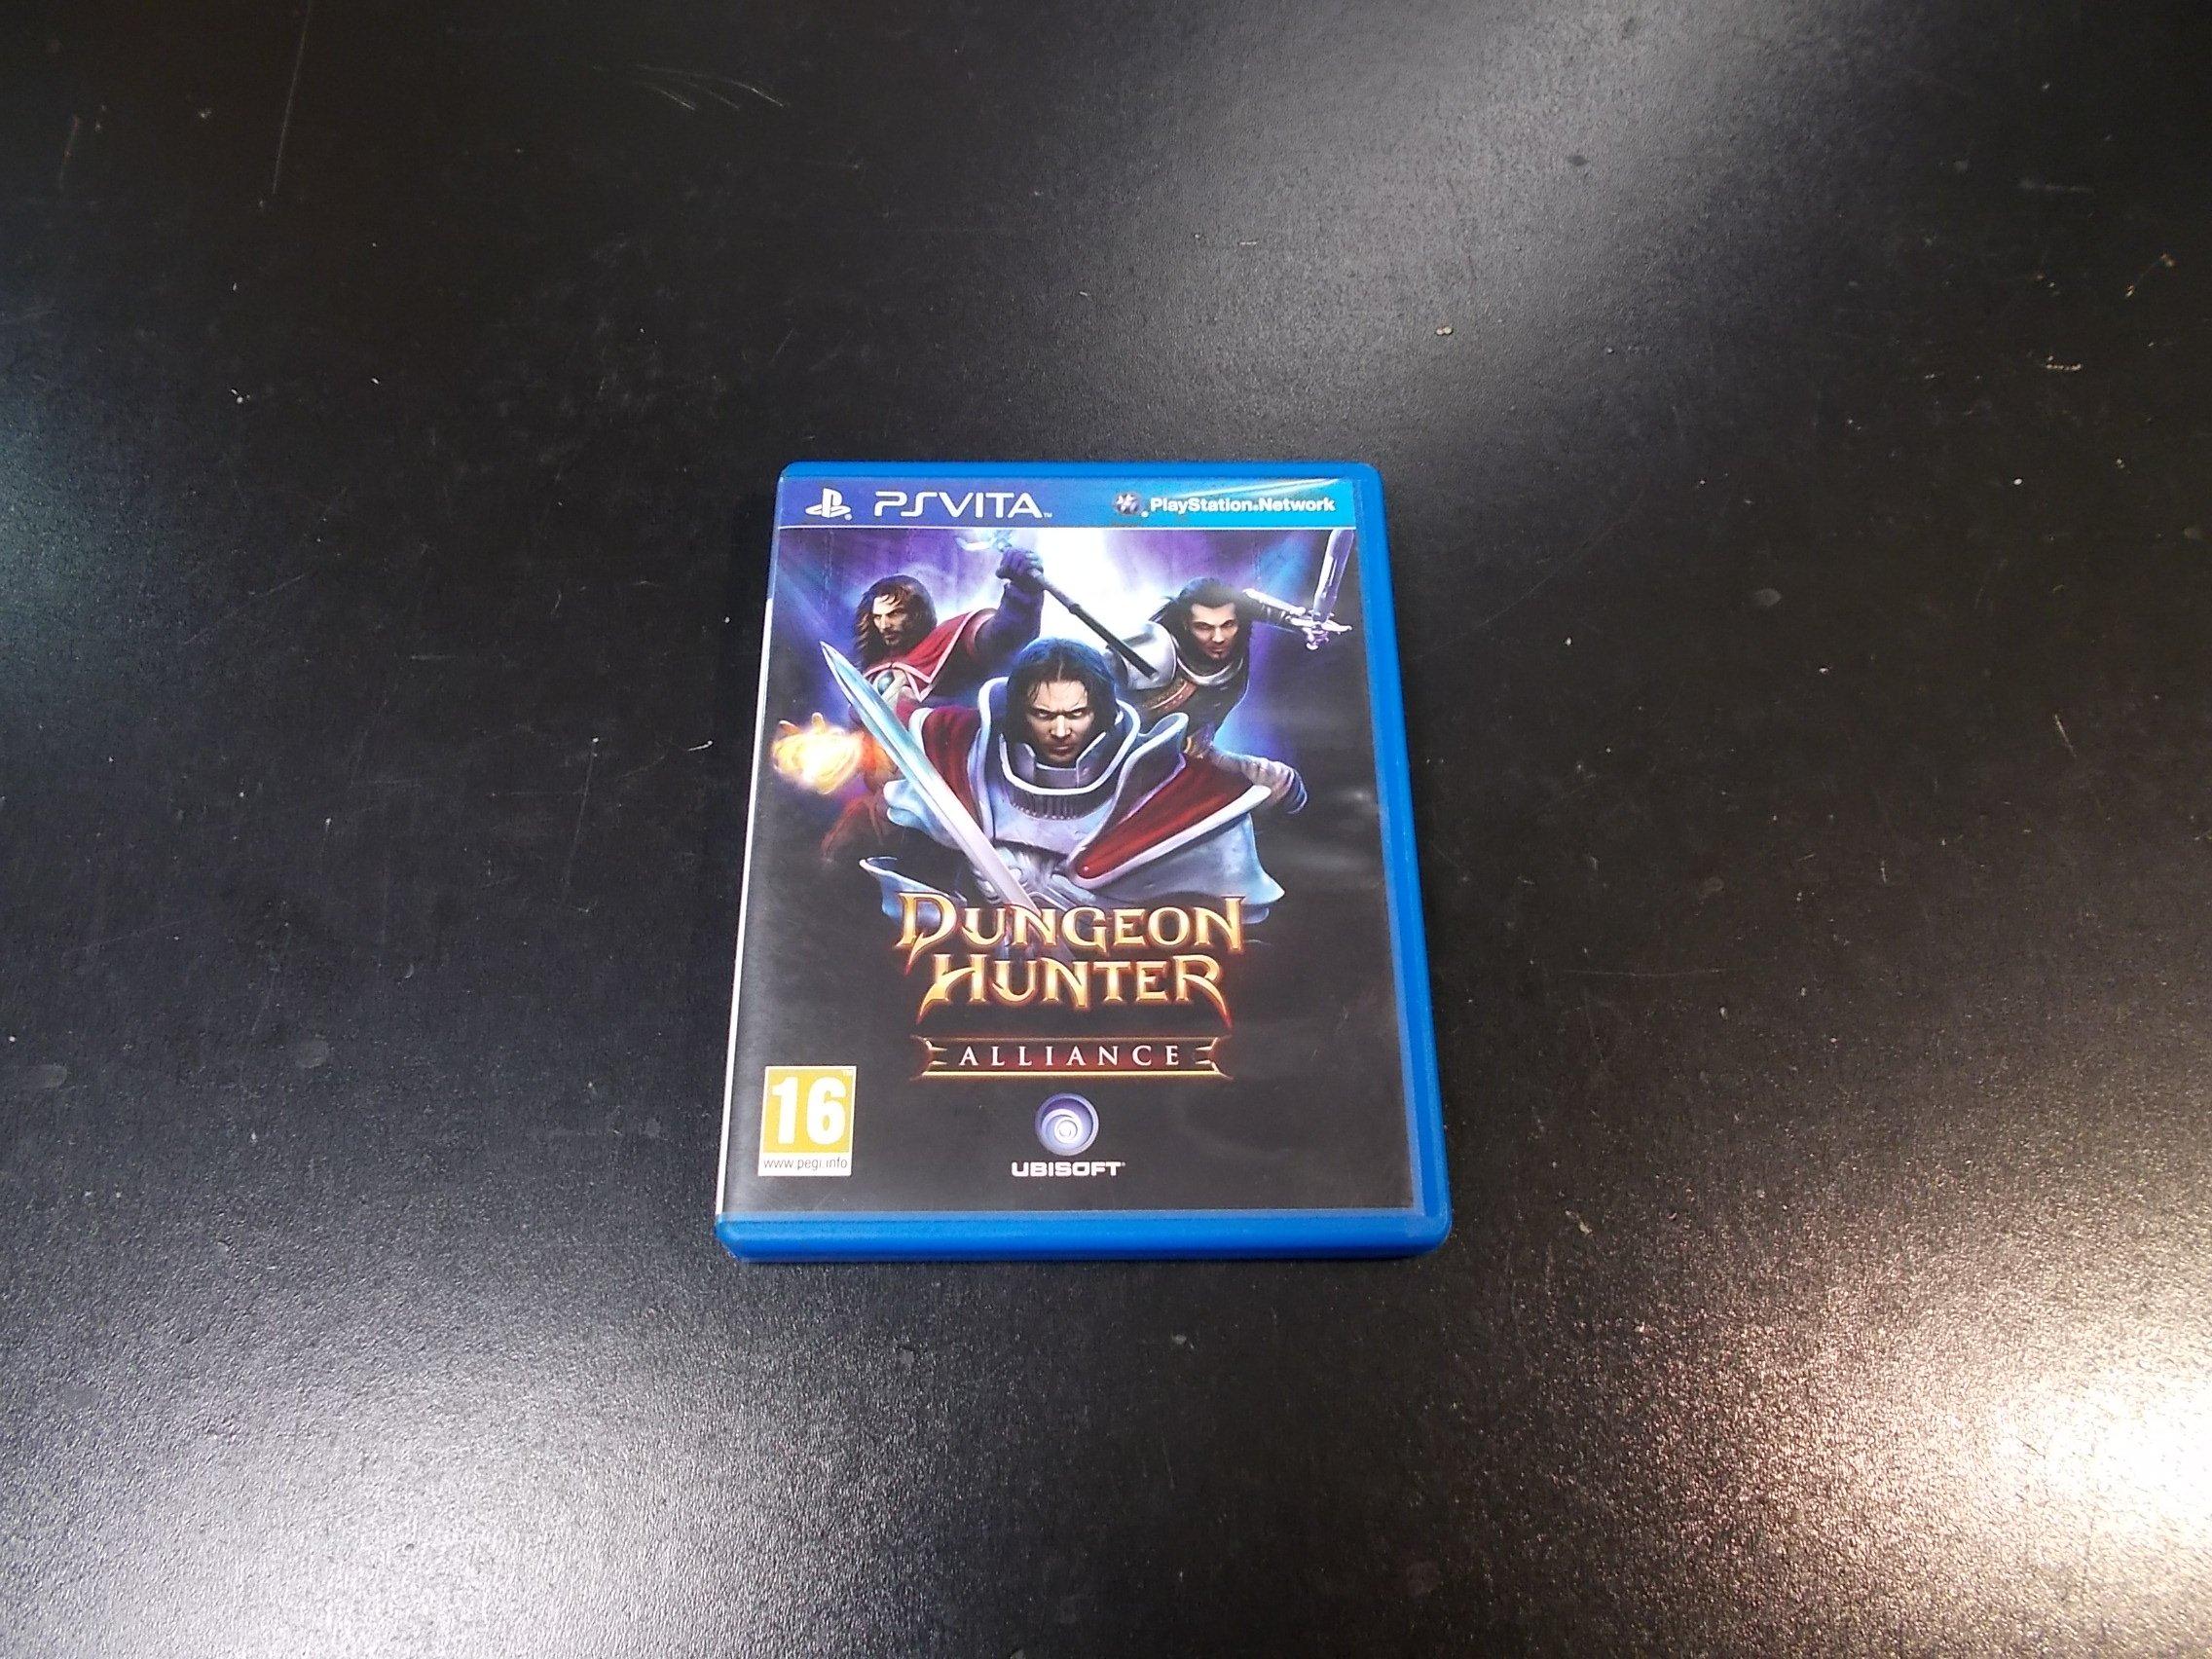 Dungeon Hunter Alliance - GRA Ps Vita - Opole 0245